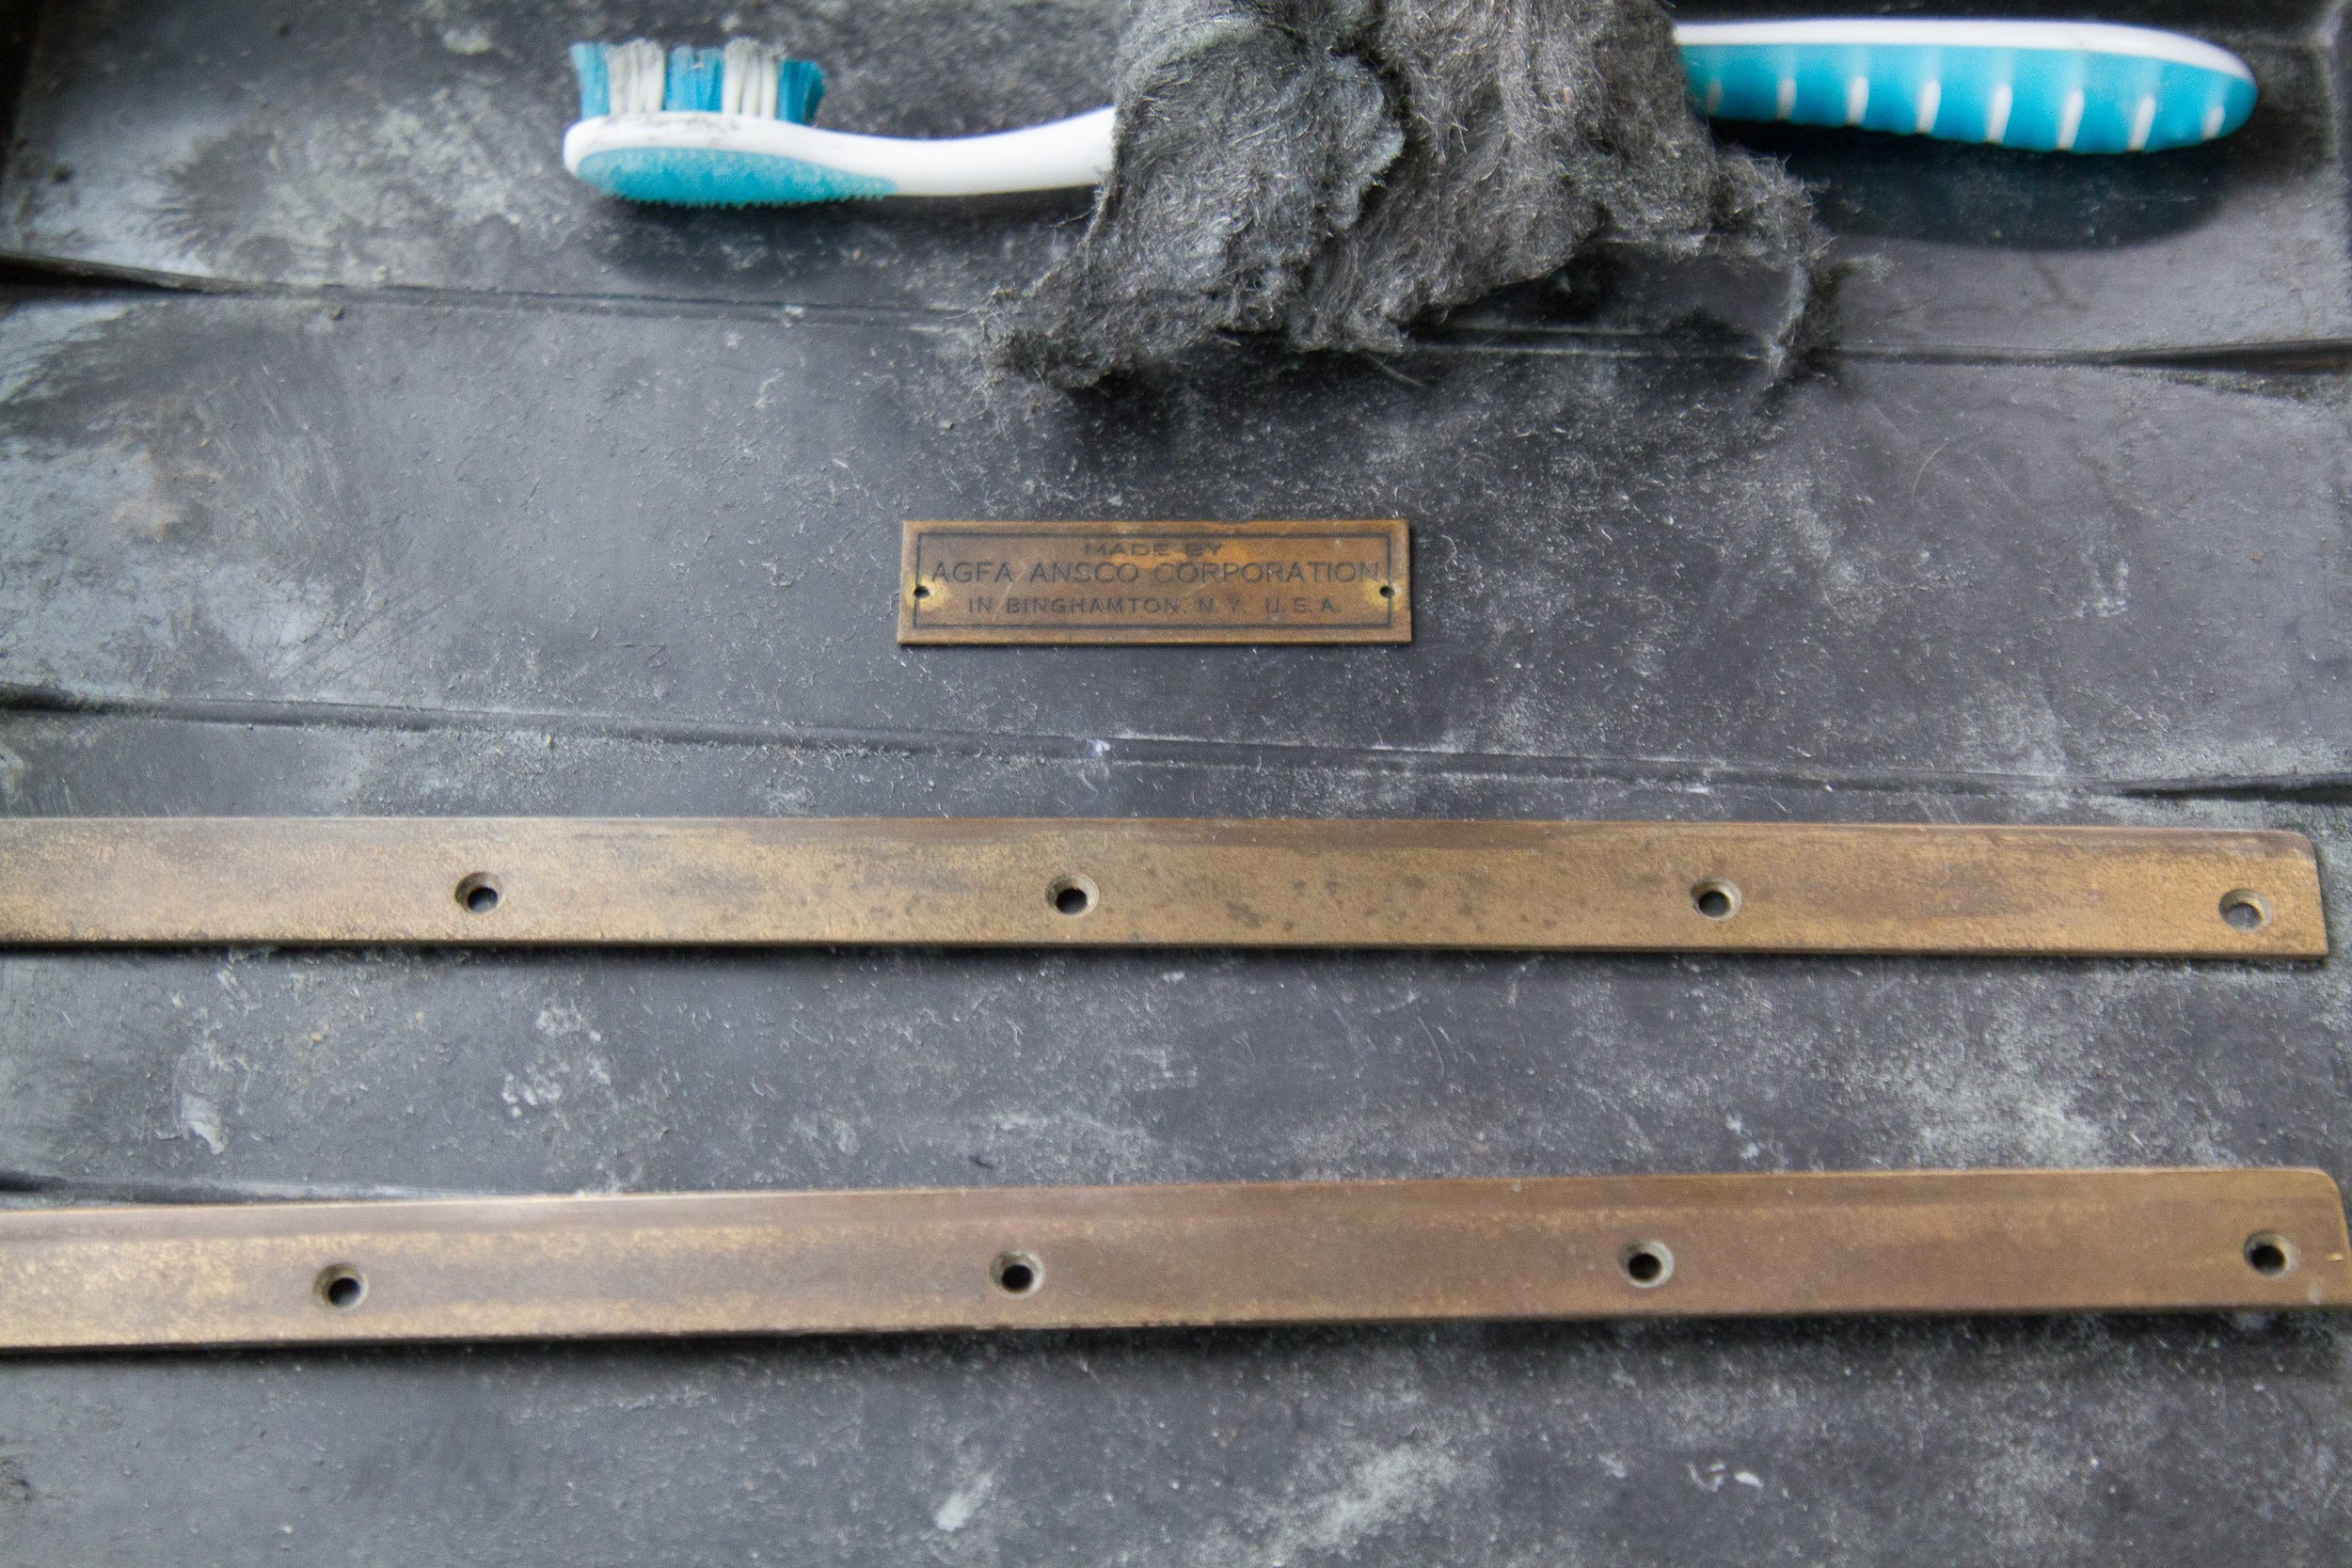 Severely tarnished brass rails